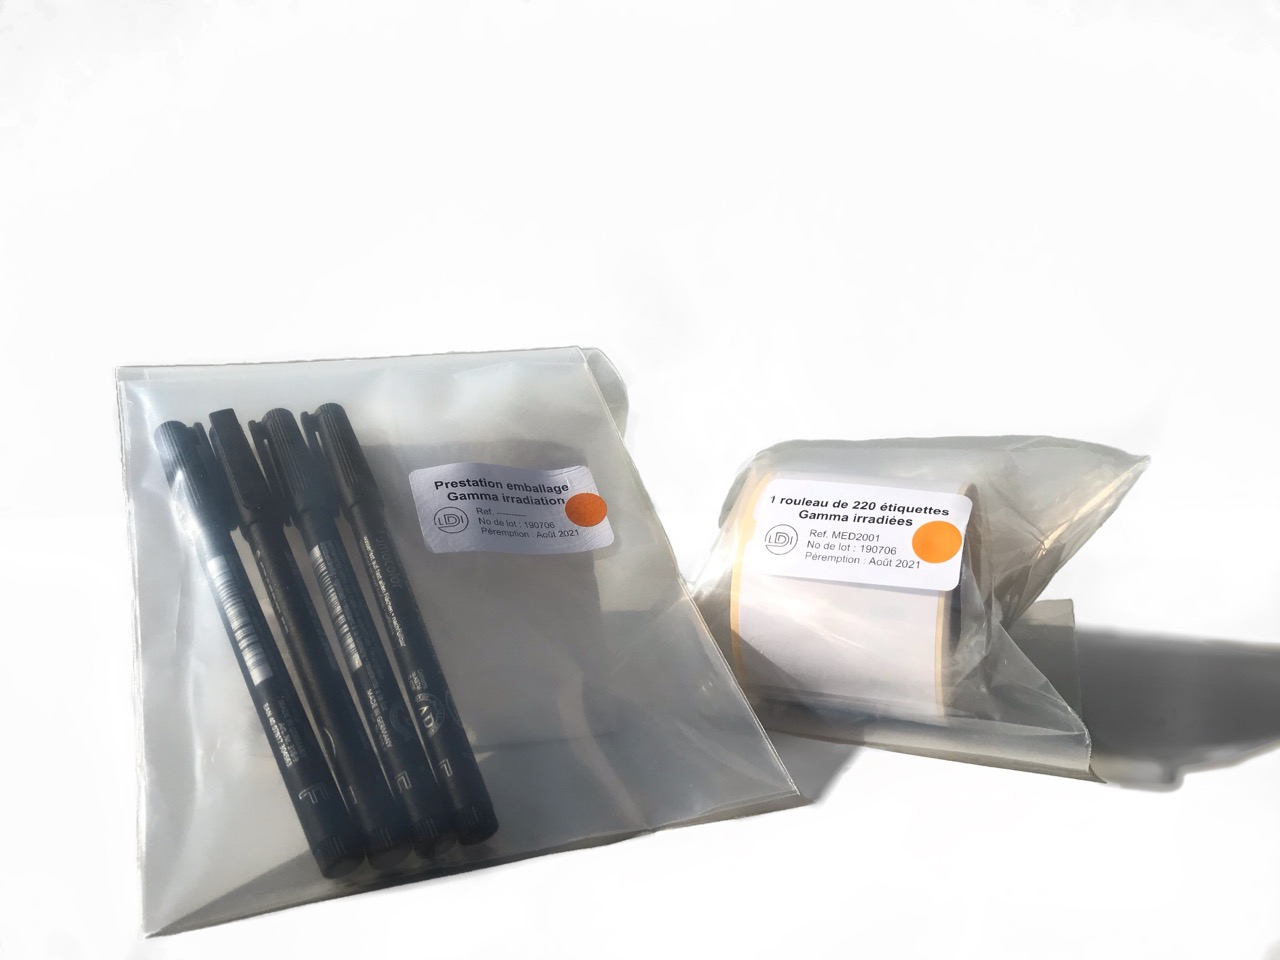 image pack stylo+etiquettes